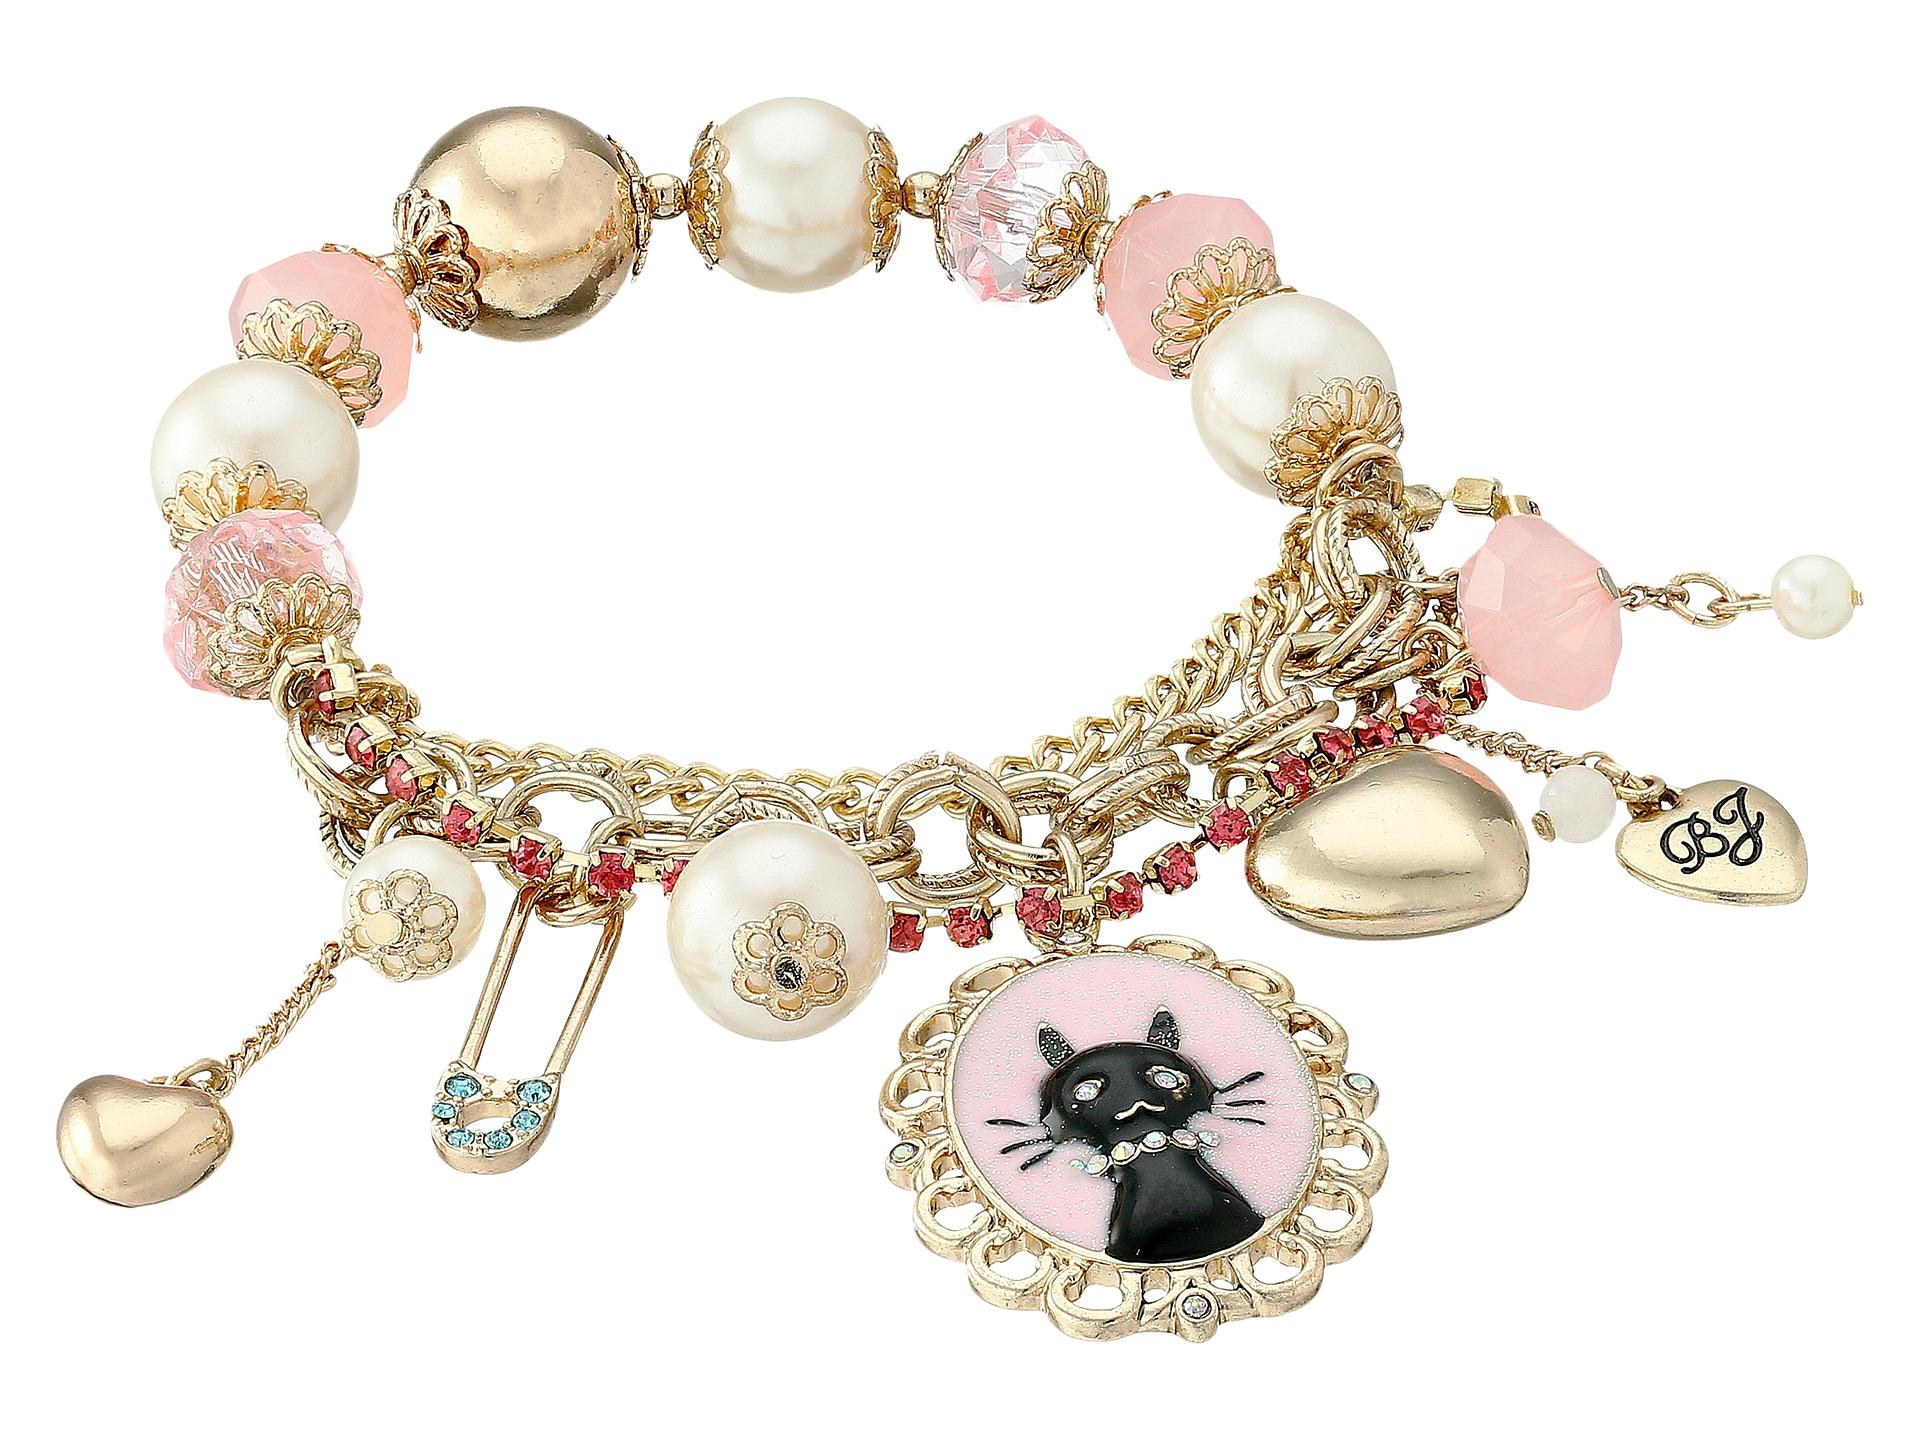 Lyst - Betsey Johnson Boxed Black Cat Charm Bracelet in Pink